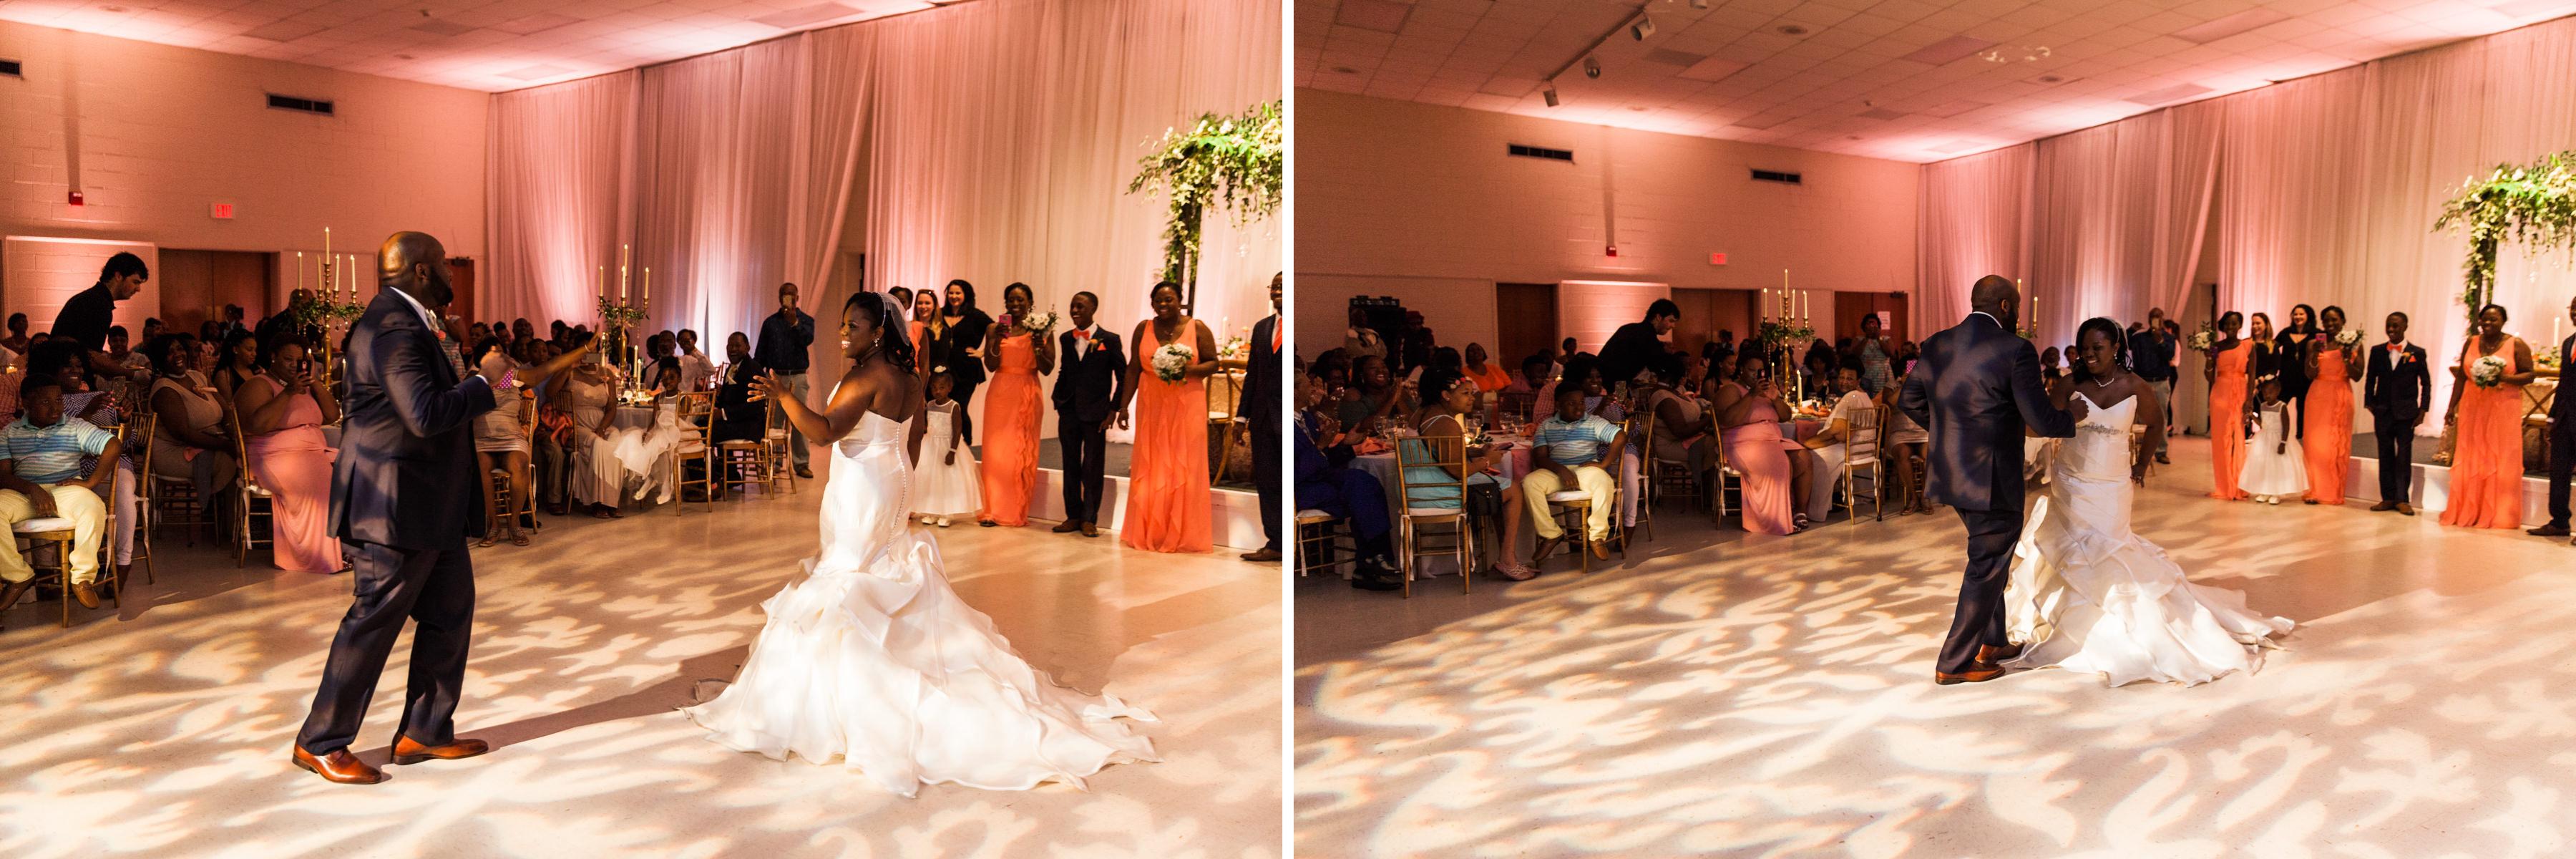 FLOWERS_WEDDING_SELMA_ALABAMA_WEDDING_PHOTOGRAPHY_138